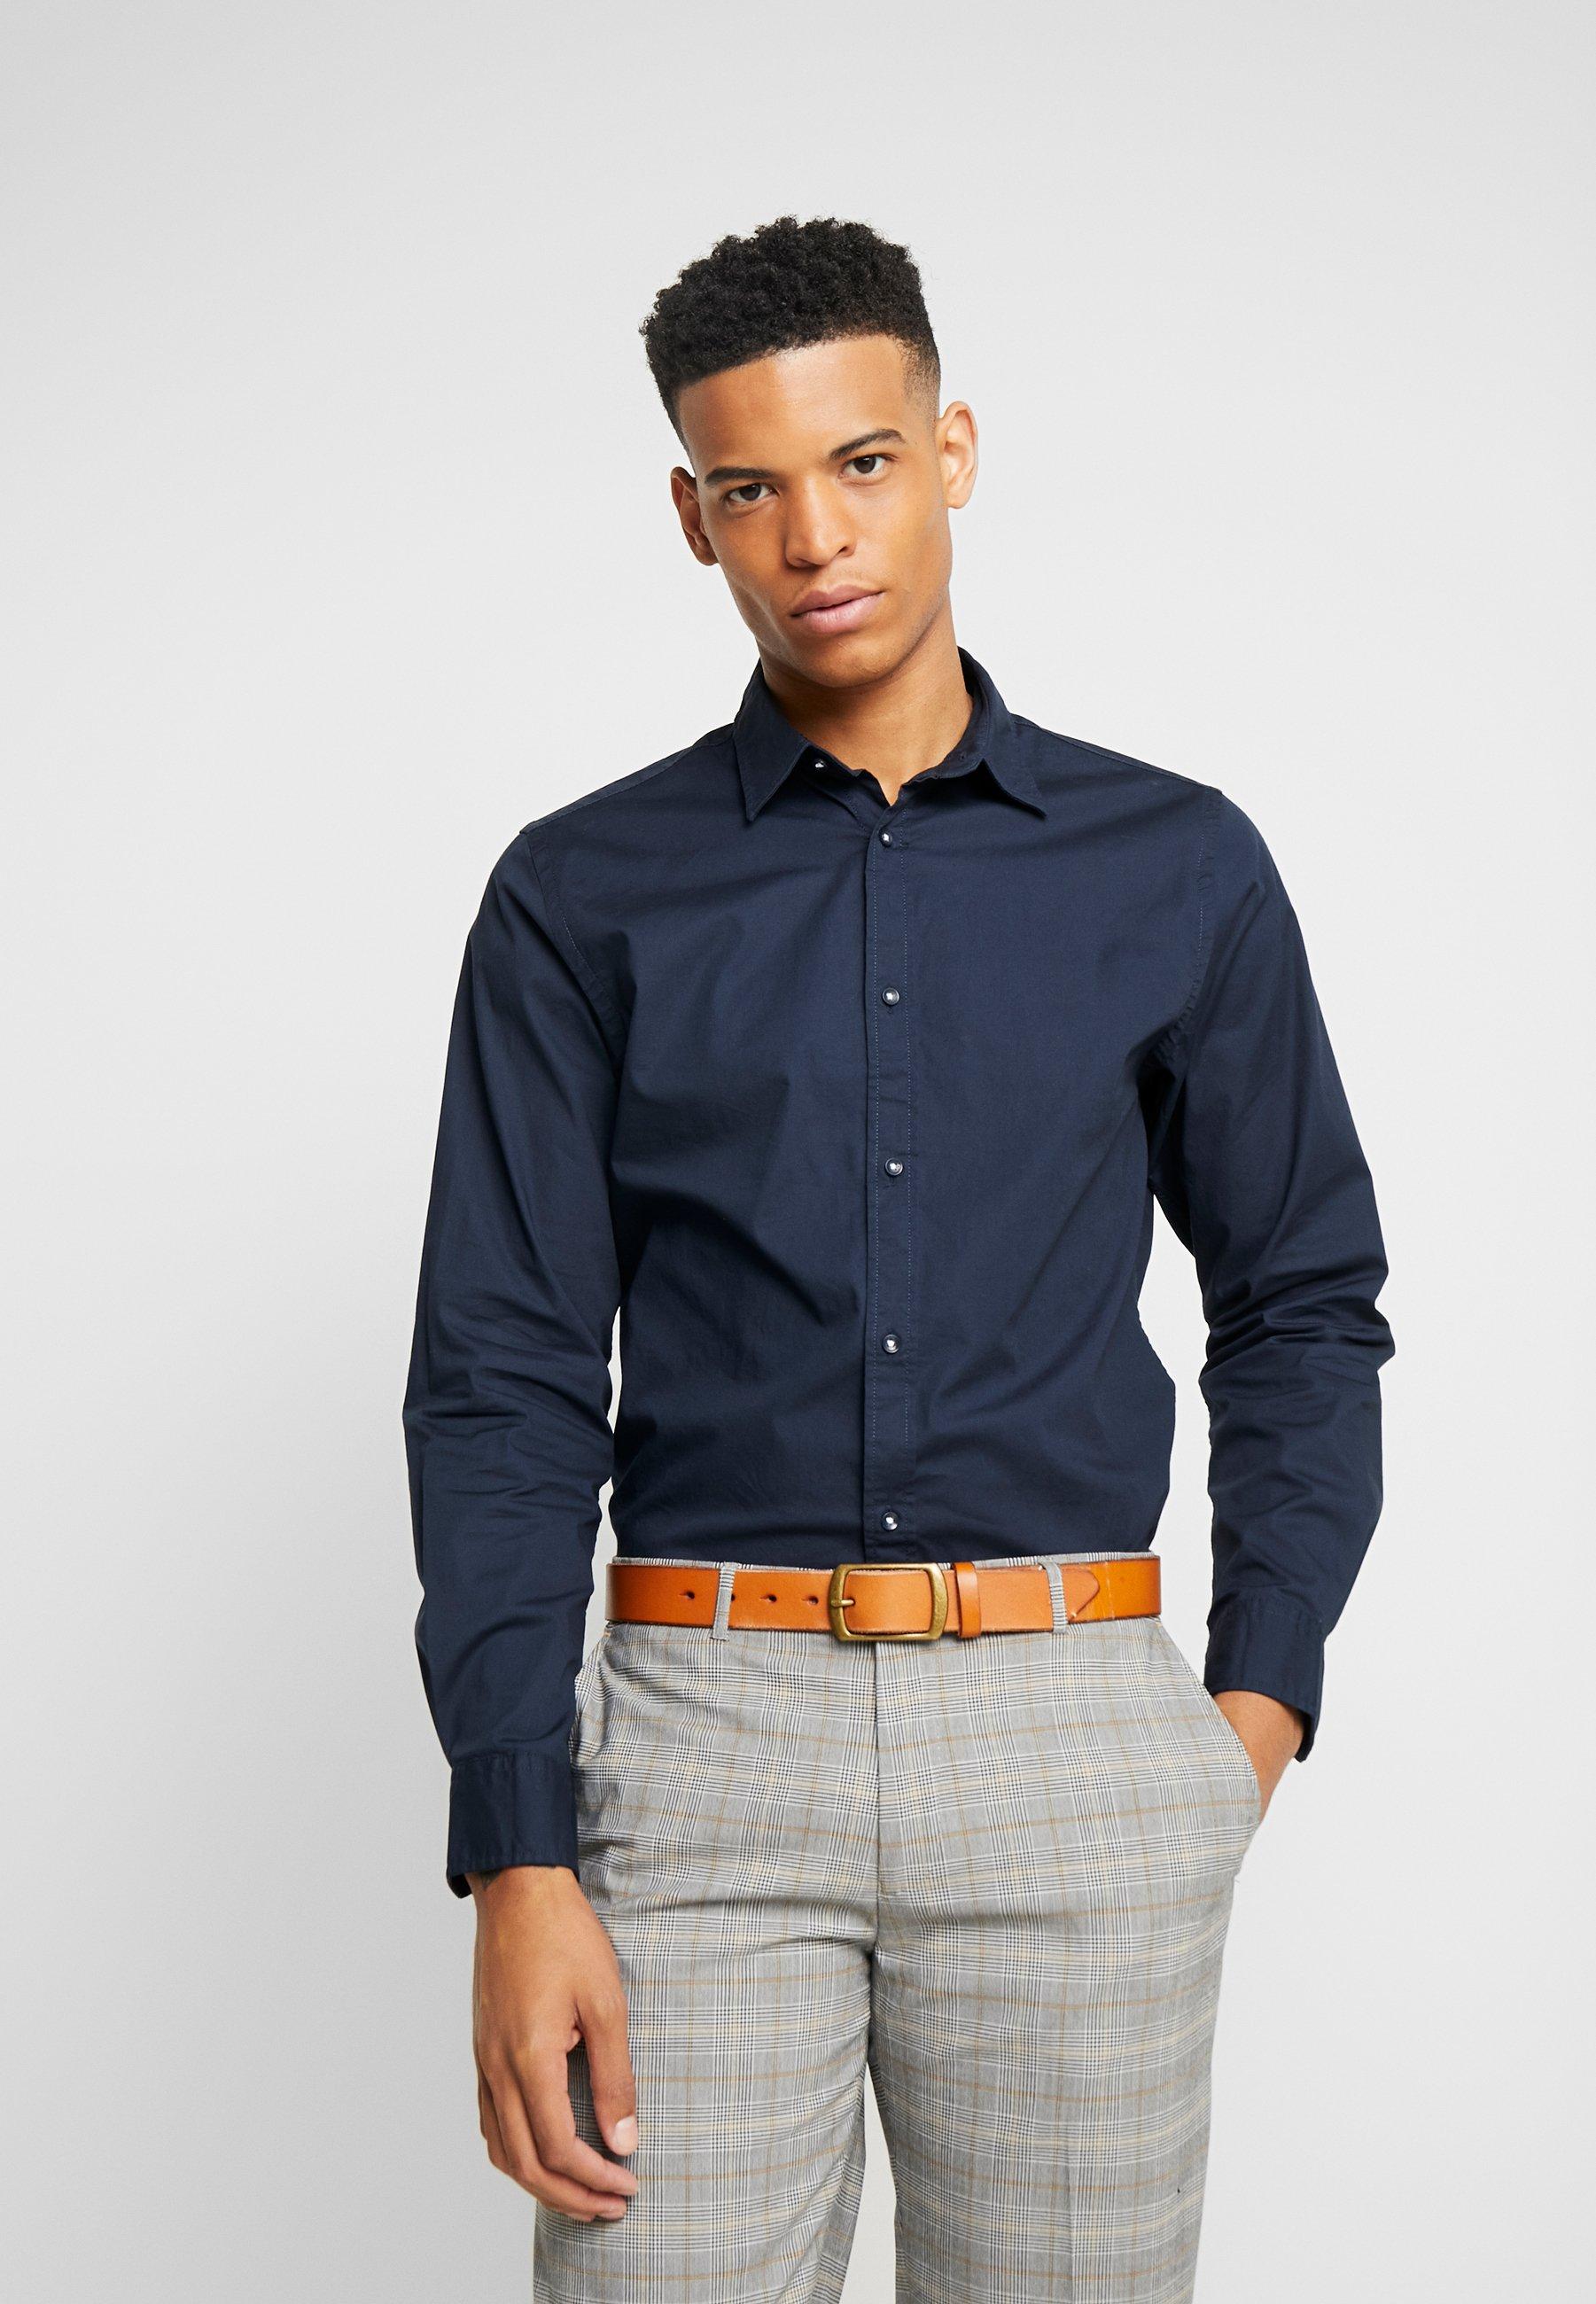 ShirtCamicia Eclipse Jwhclint Elegante Total Jackamp; Jones Ov80wNnm